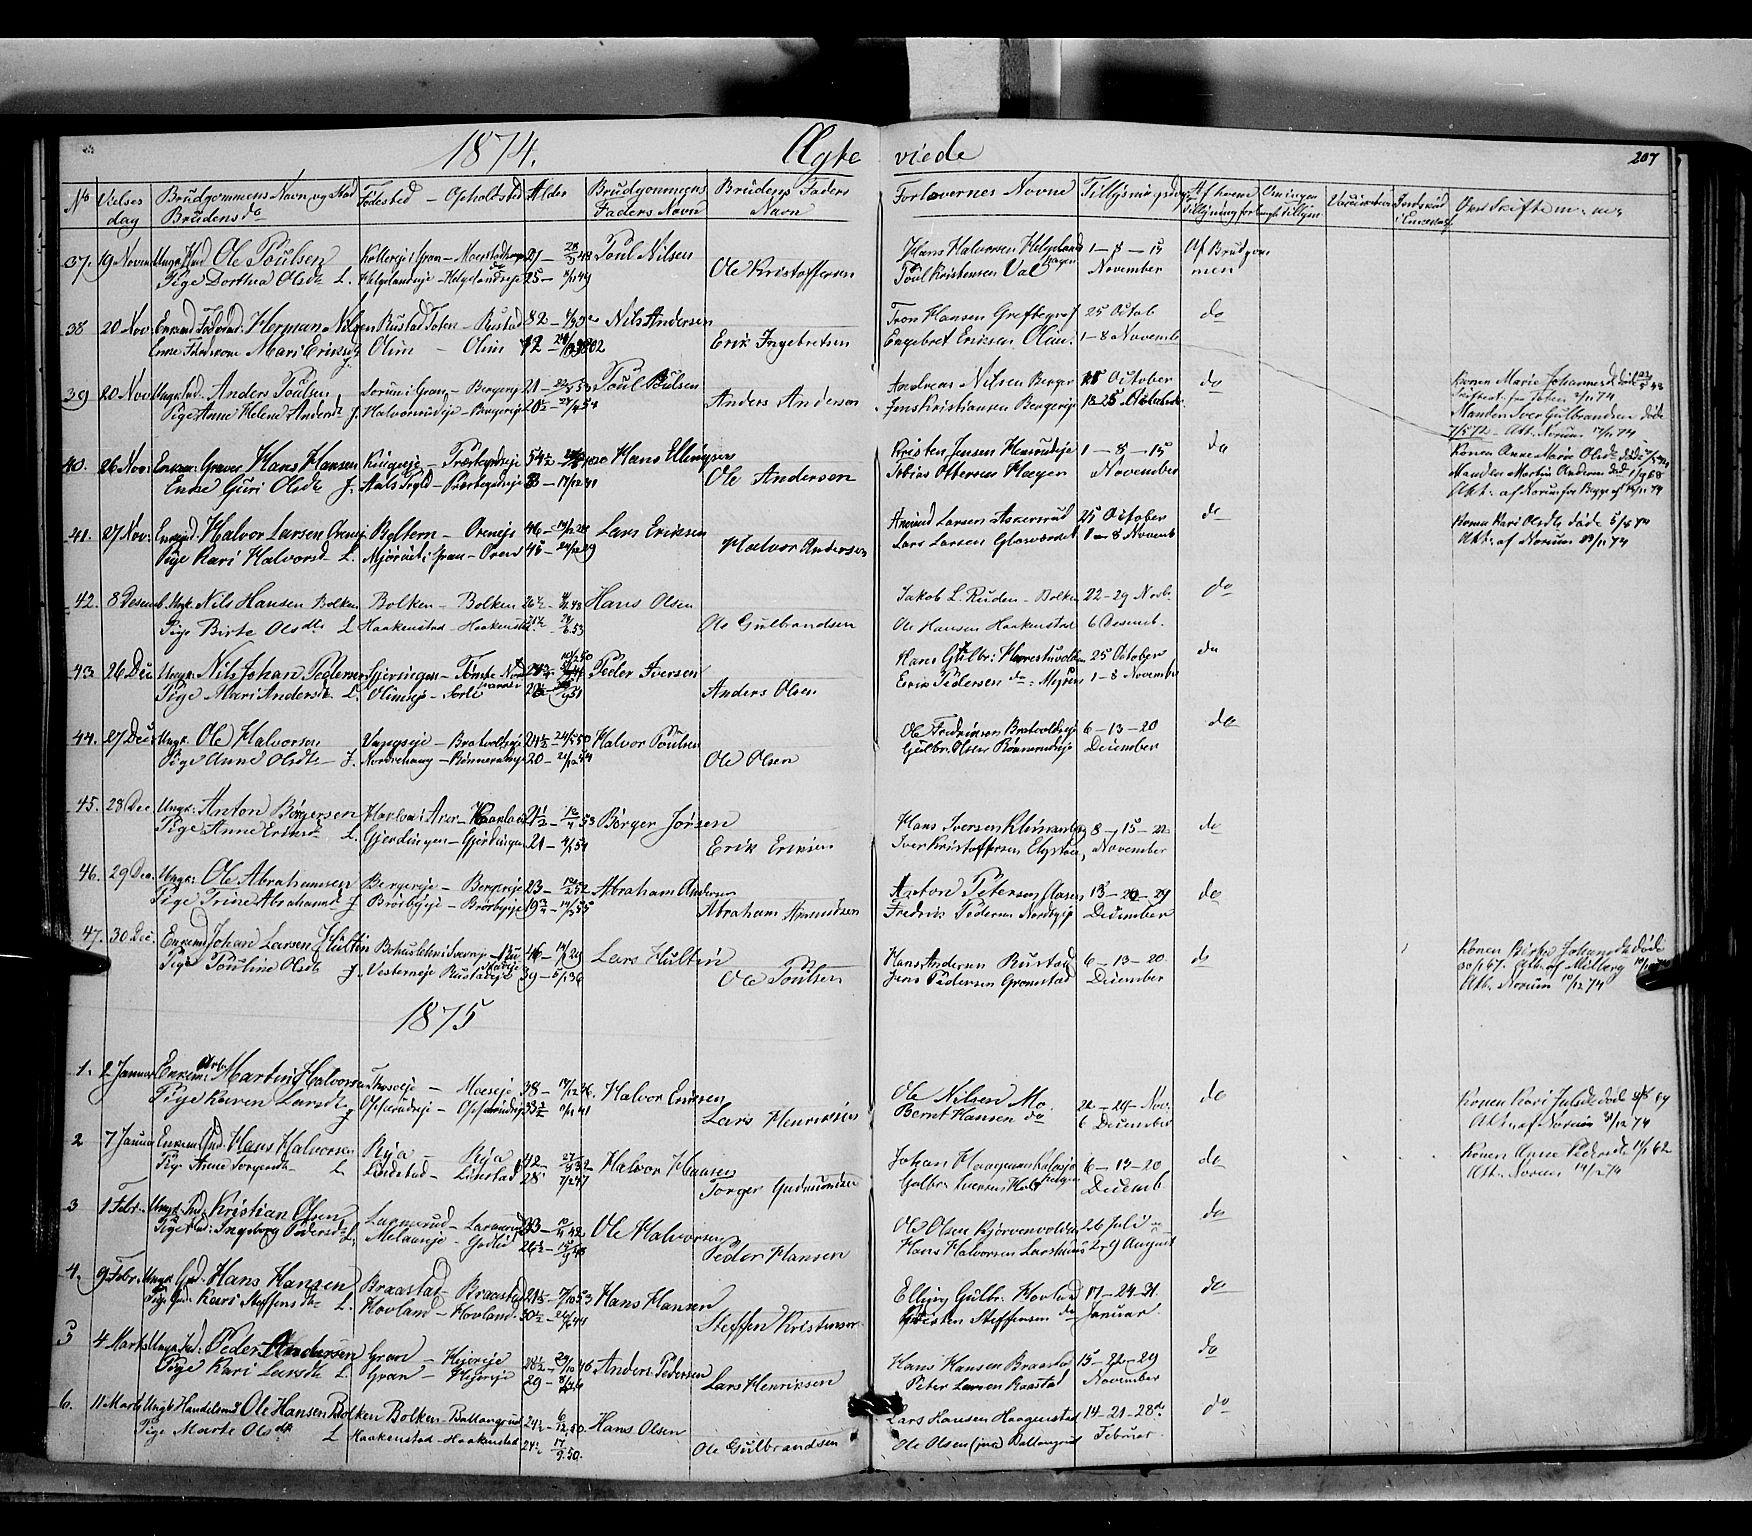 SAH, Jevnaker prestekontor, Ministerialbok nr. 7, 1858-1876, s. 207